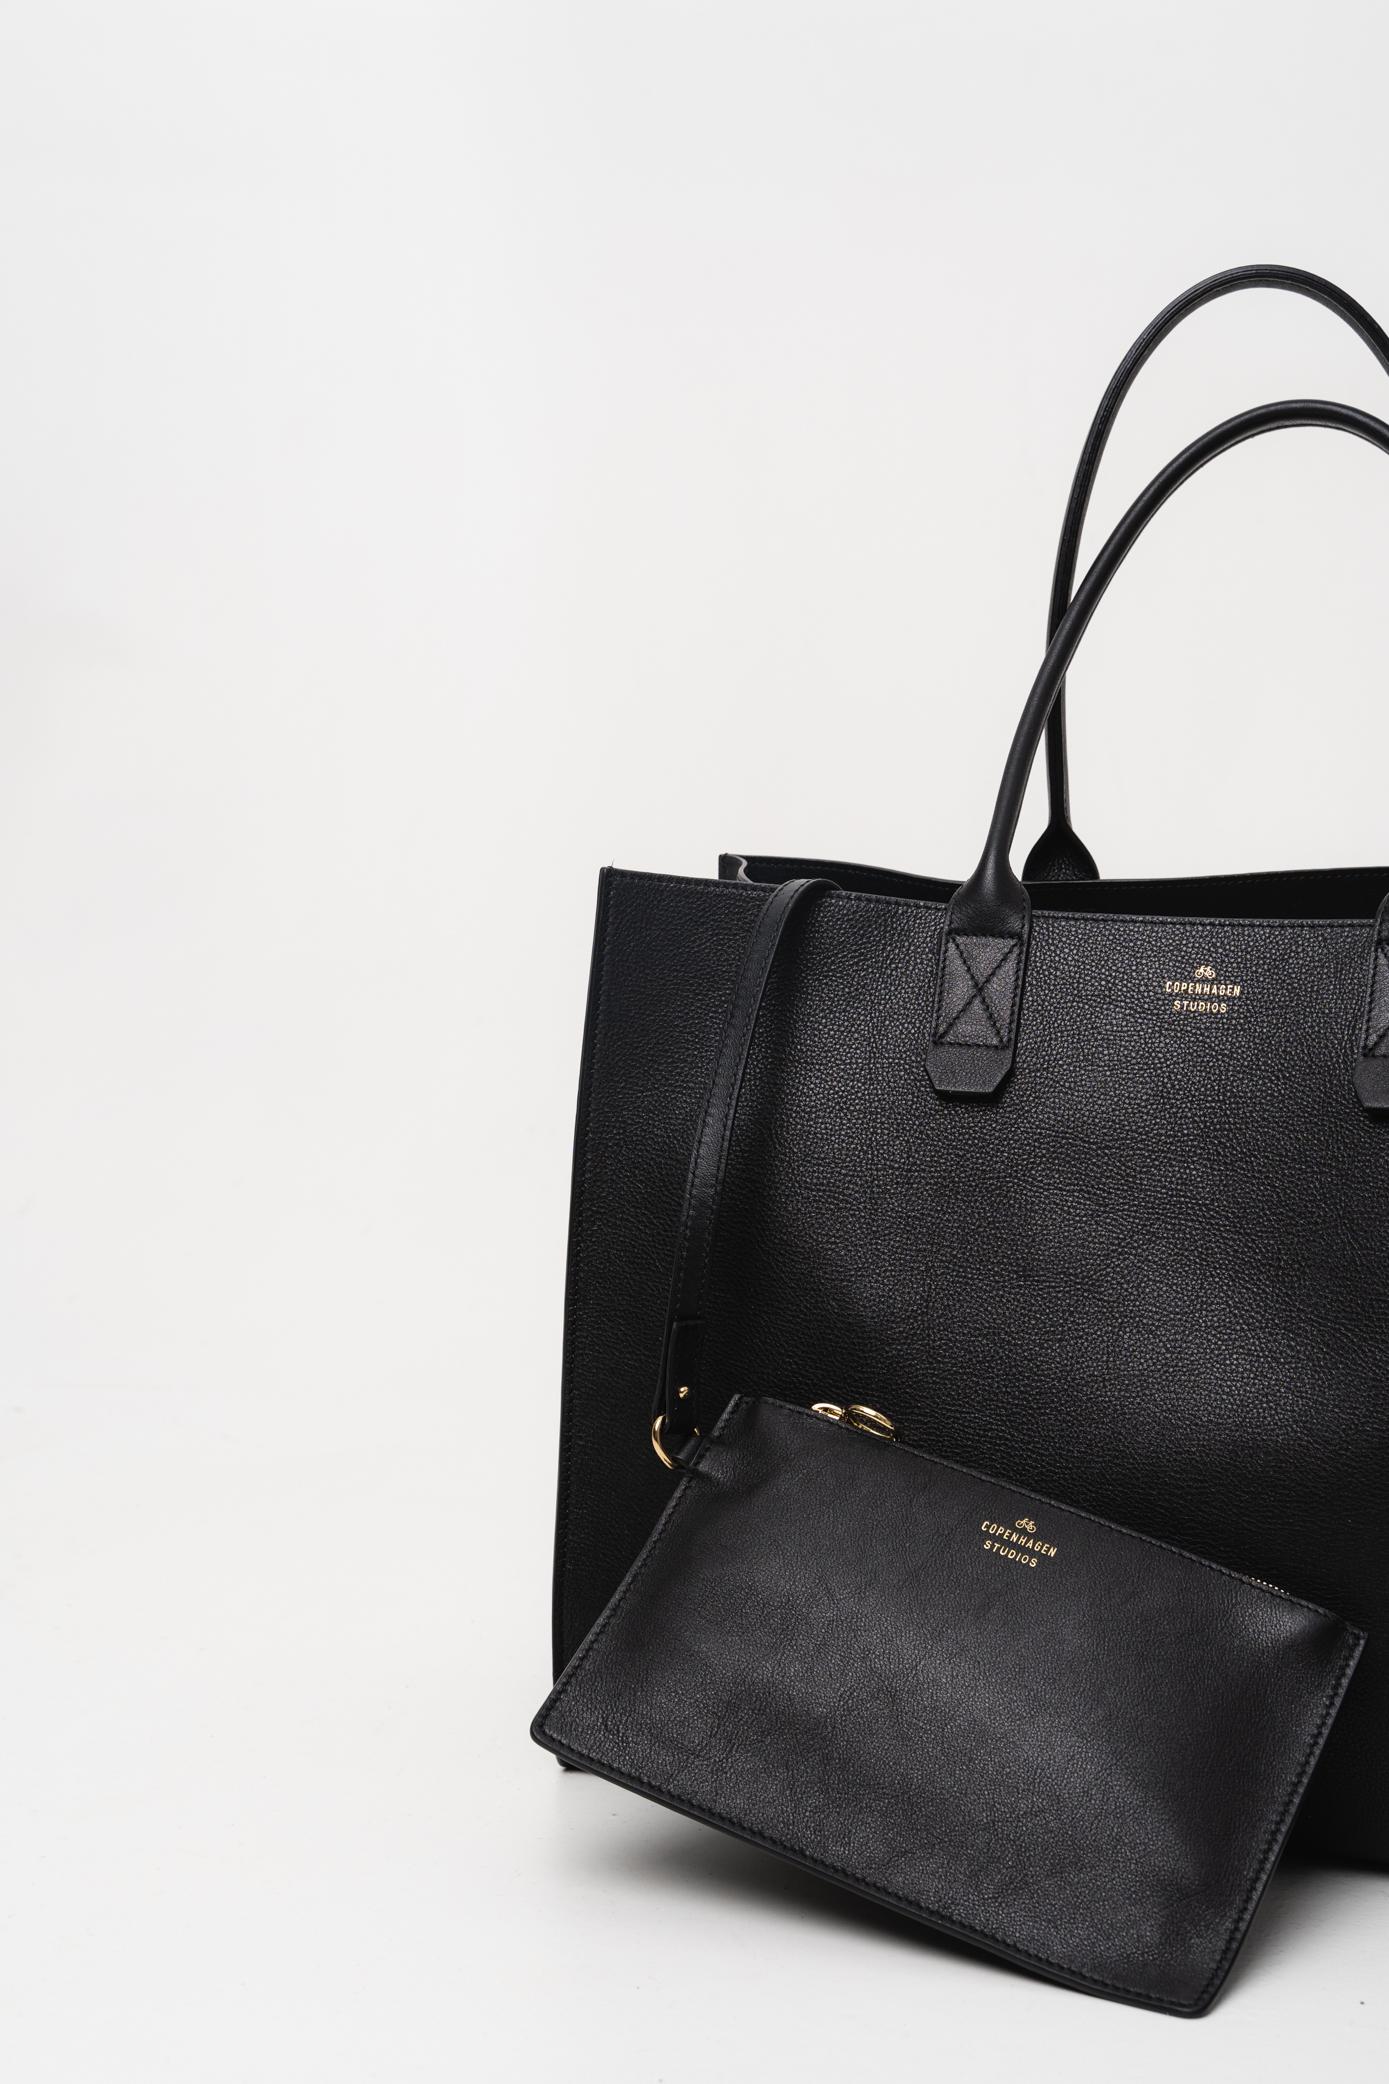 CPH Bag 6 vitello black - alternative 5